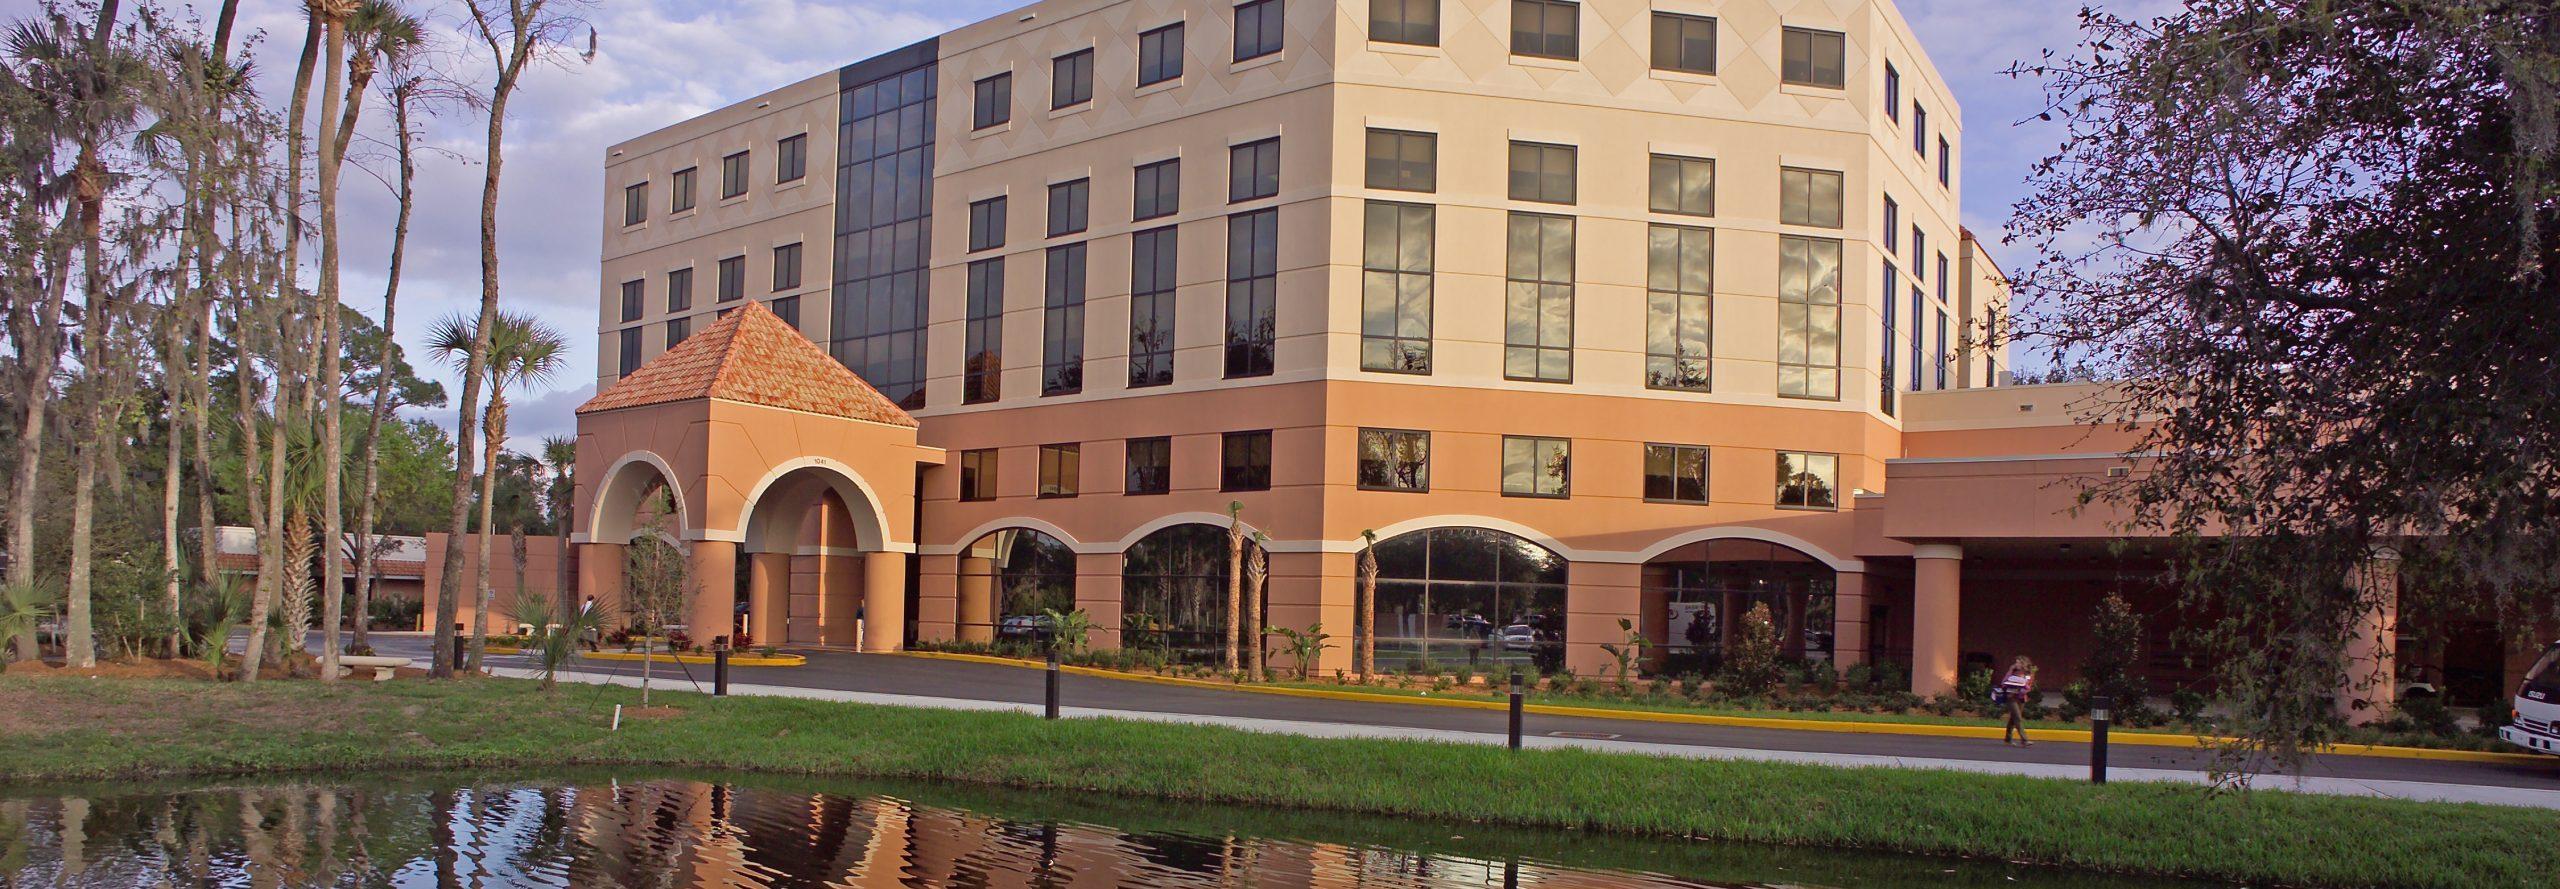 Halifax Health Medical Center of Port Orange